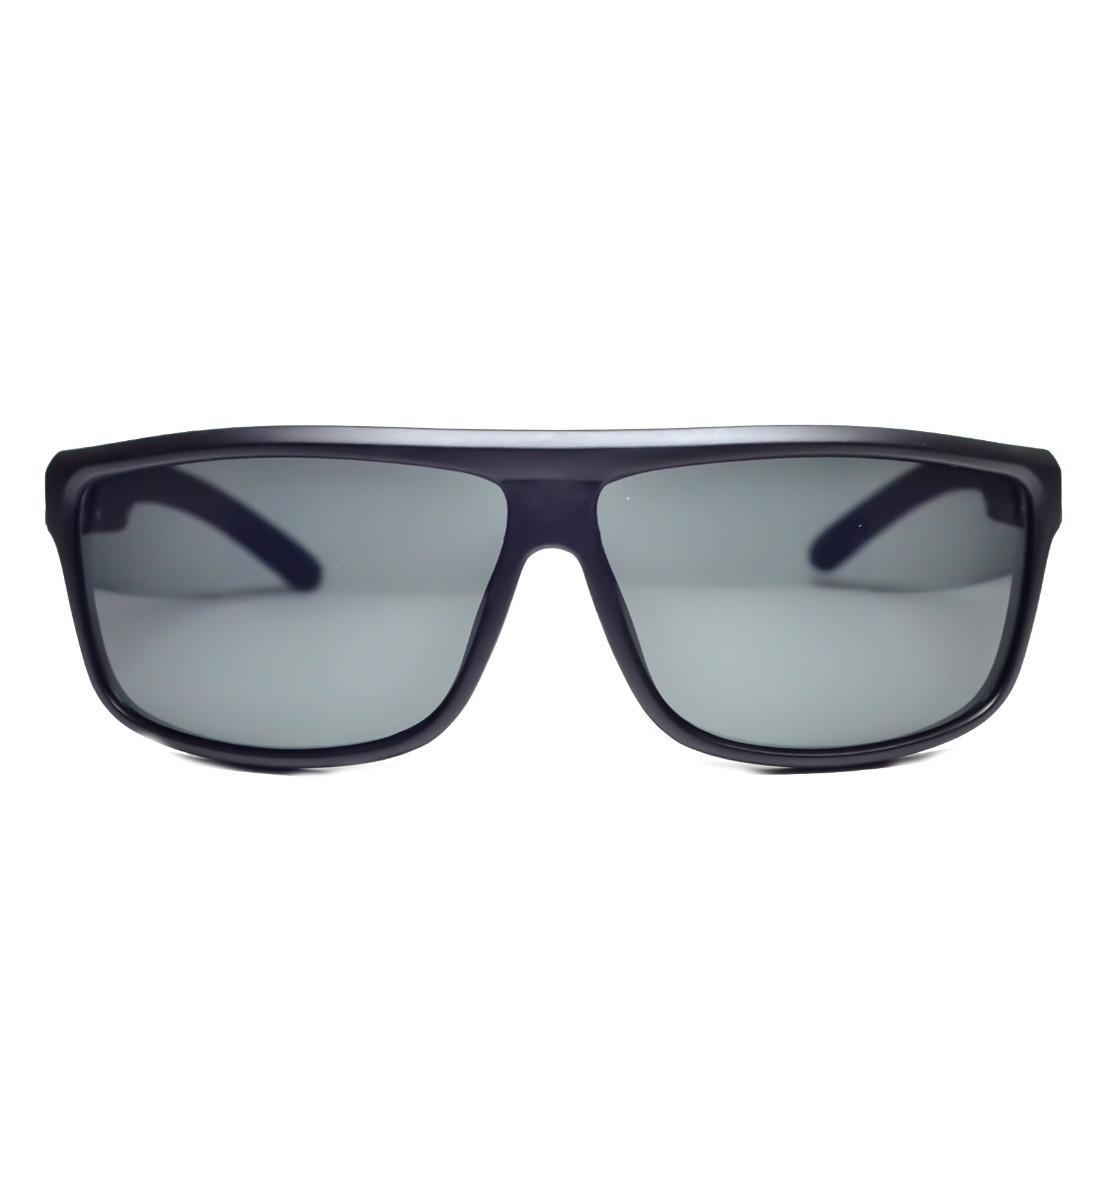 76818a9a7 oculos de sol masculino esportivo grande diferente estiloso. Carregando zoom .